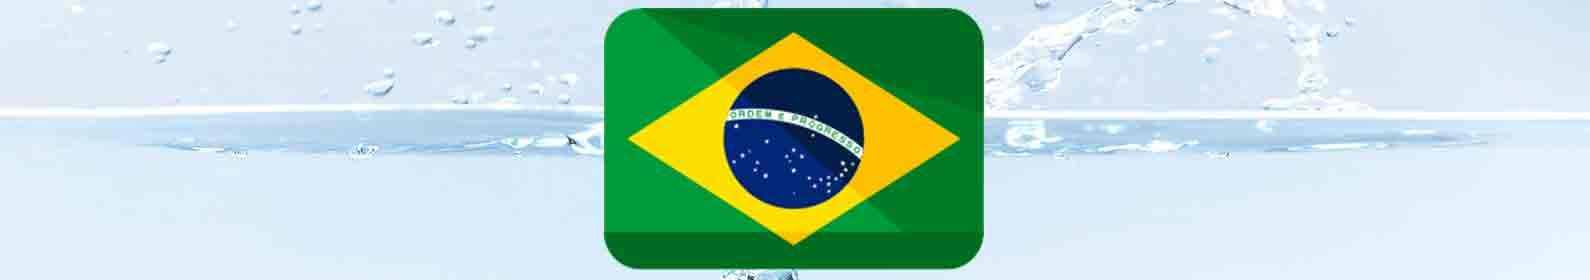 water-treatment-brazil.jpg